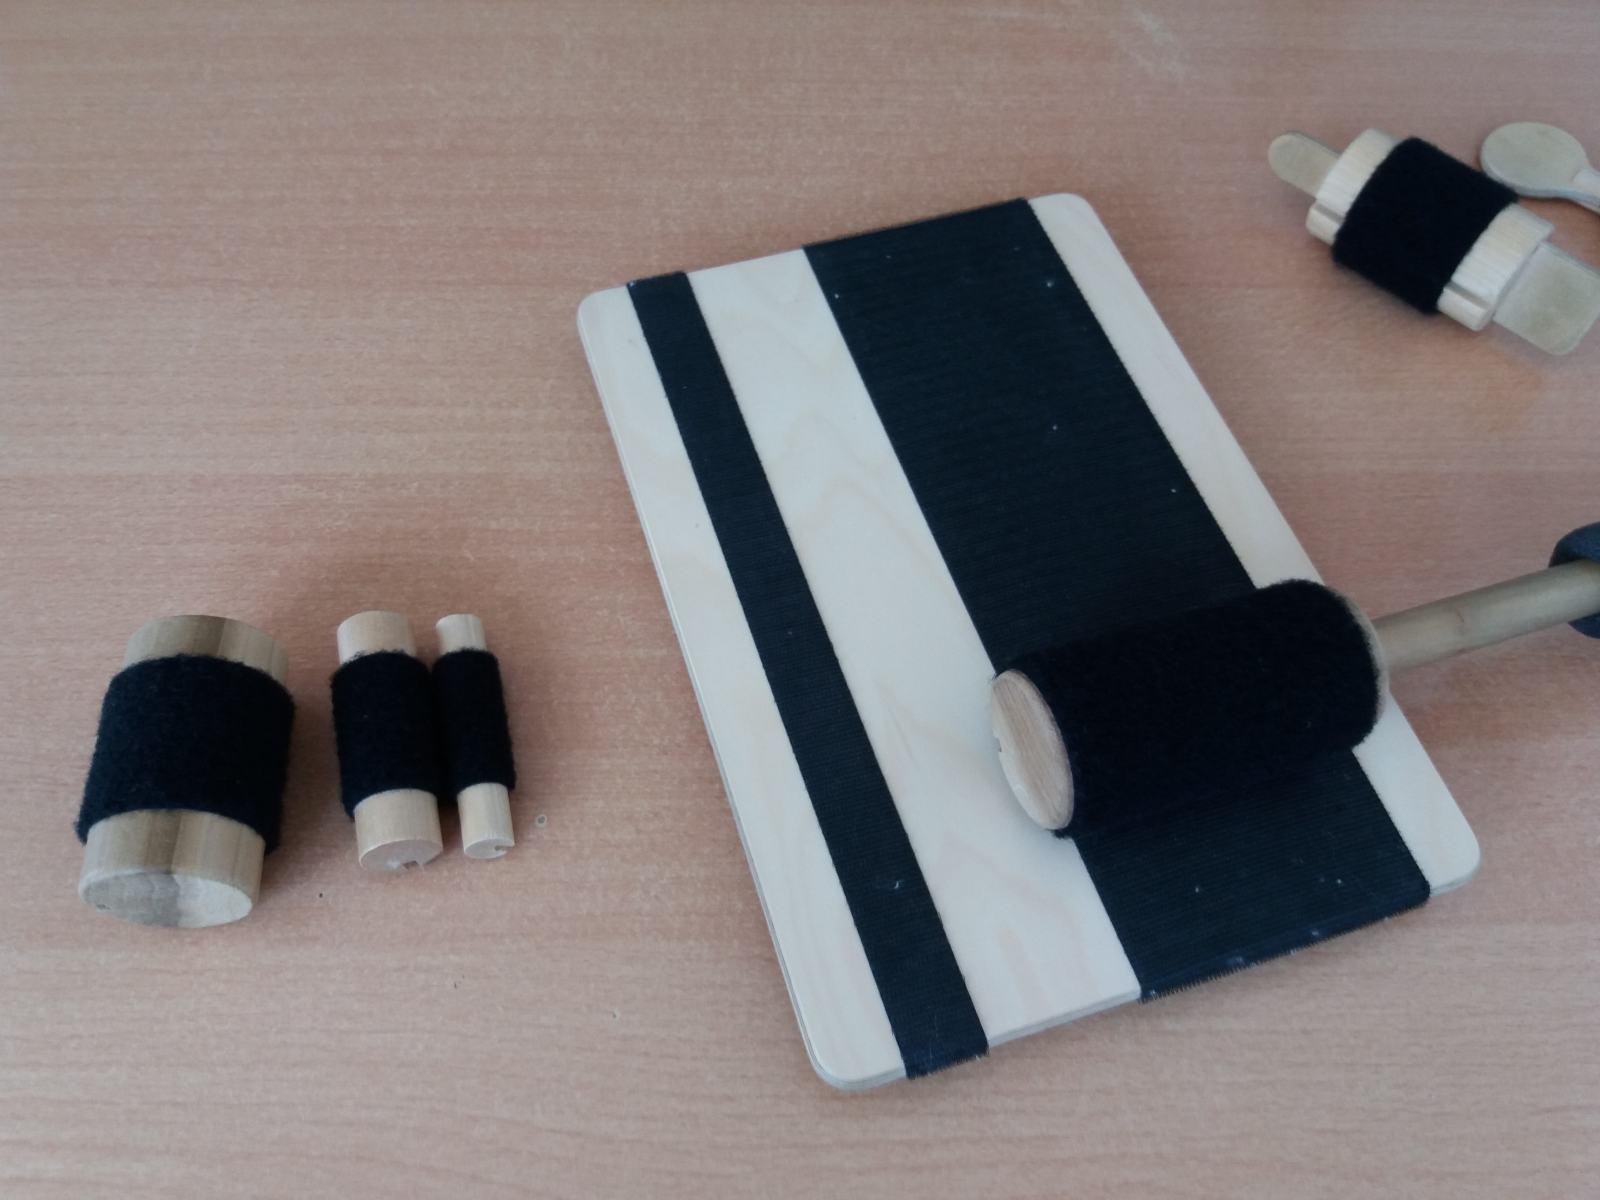 Praxisgemeinschaft-Impulse Rastatt Praxisraum Ergotherapie: Handtherapie